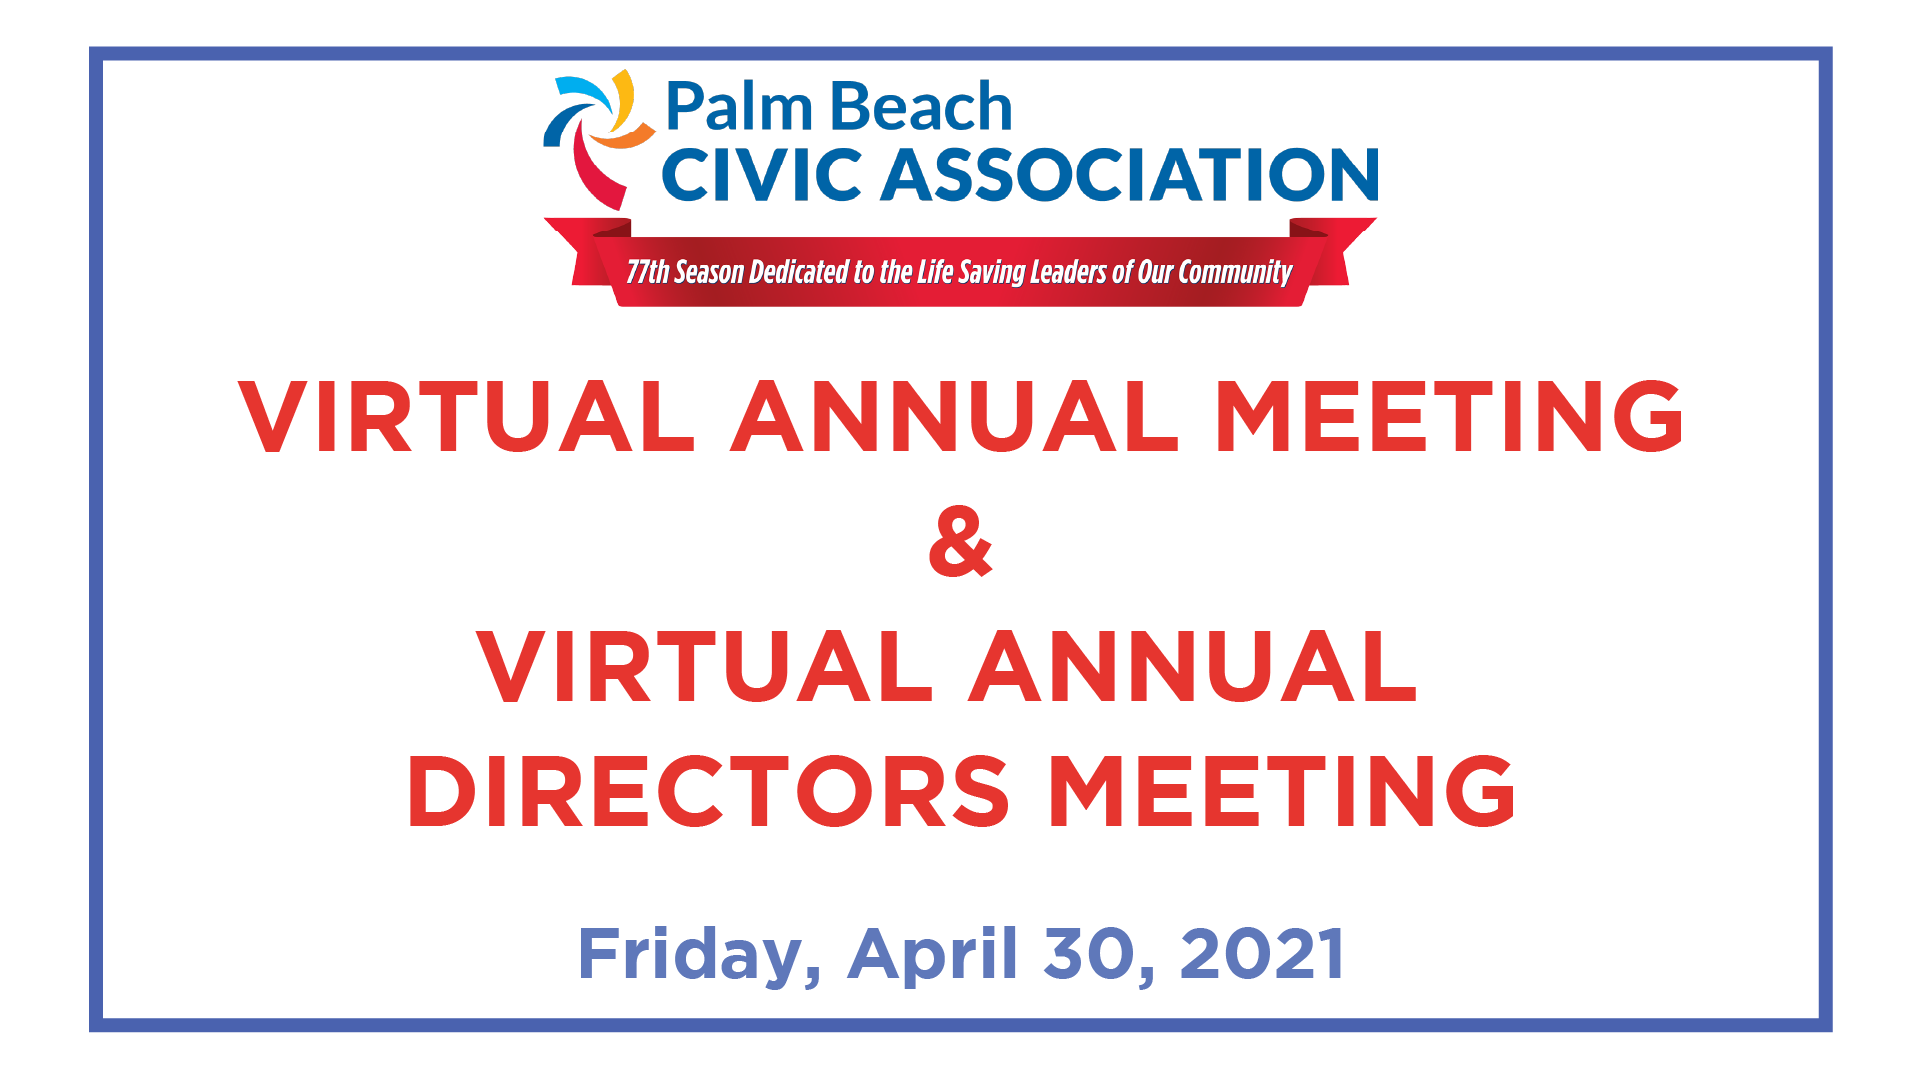 2021 Annual Meeting & Directors Meeting